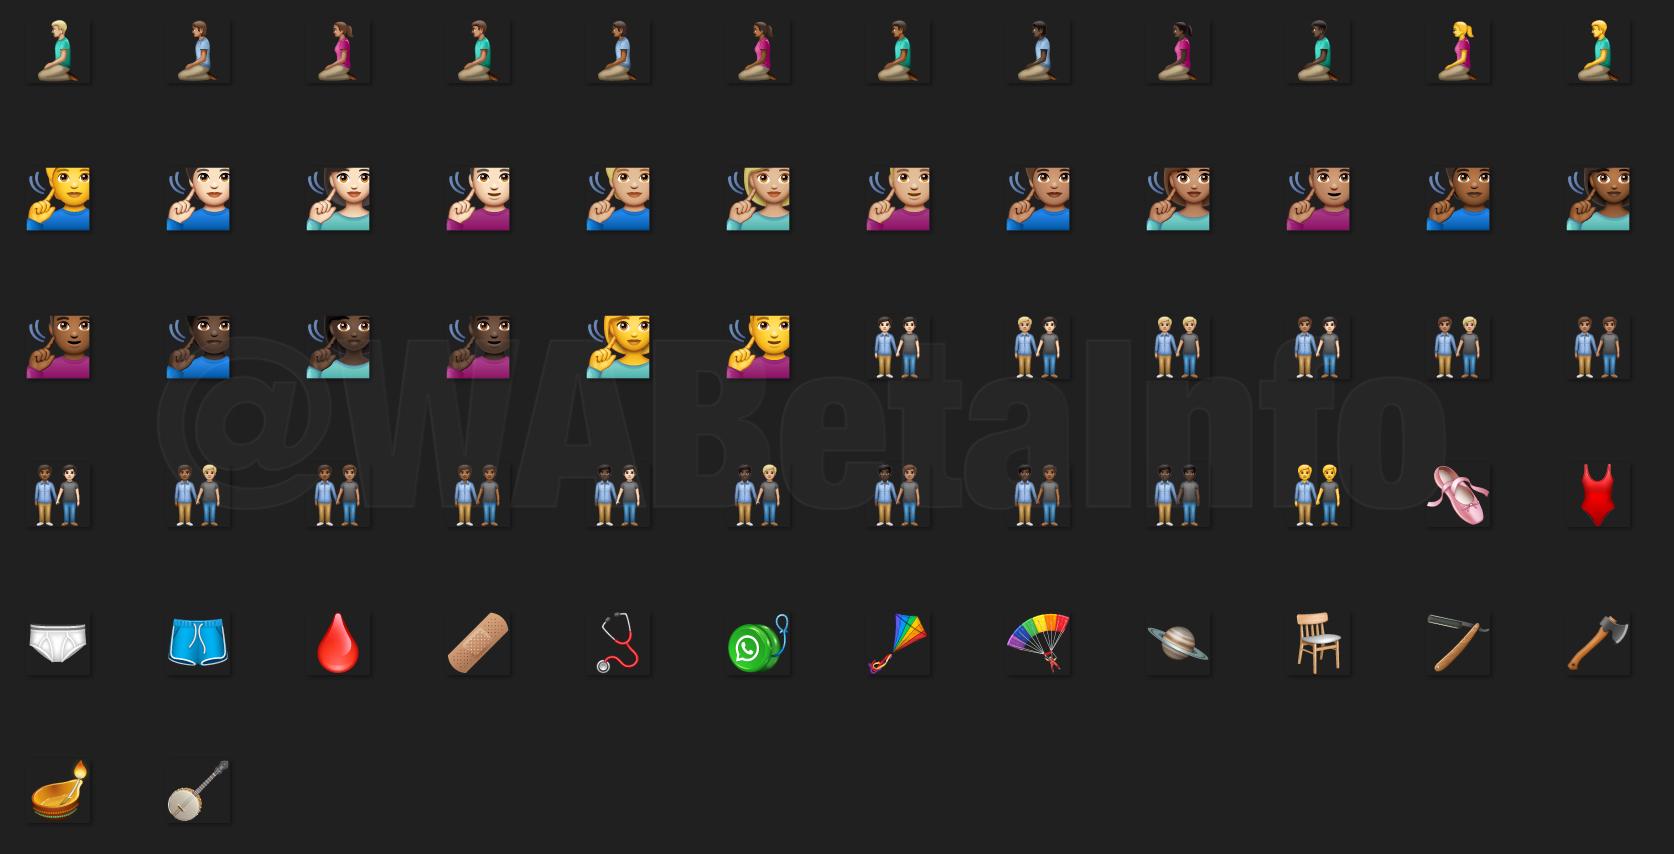 WhatsApp SURPRIZA TOATE Telefoanele emoji 3